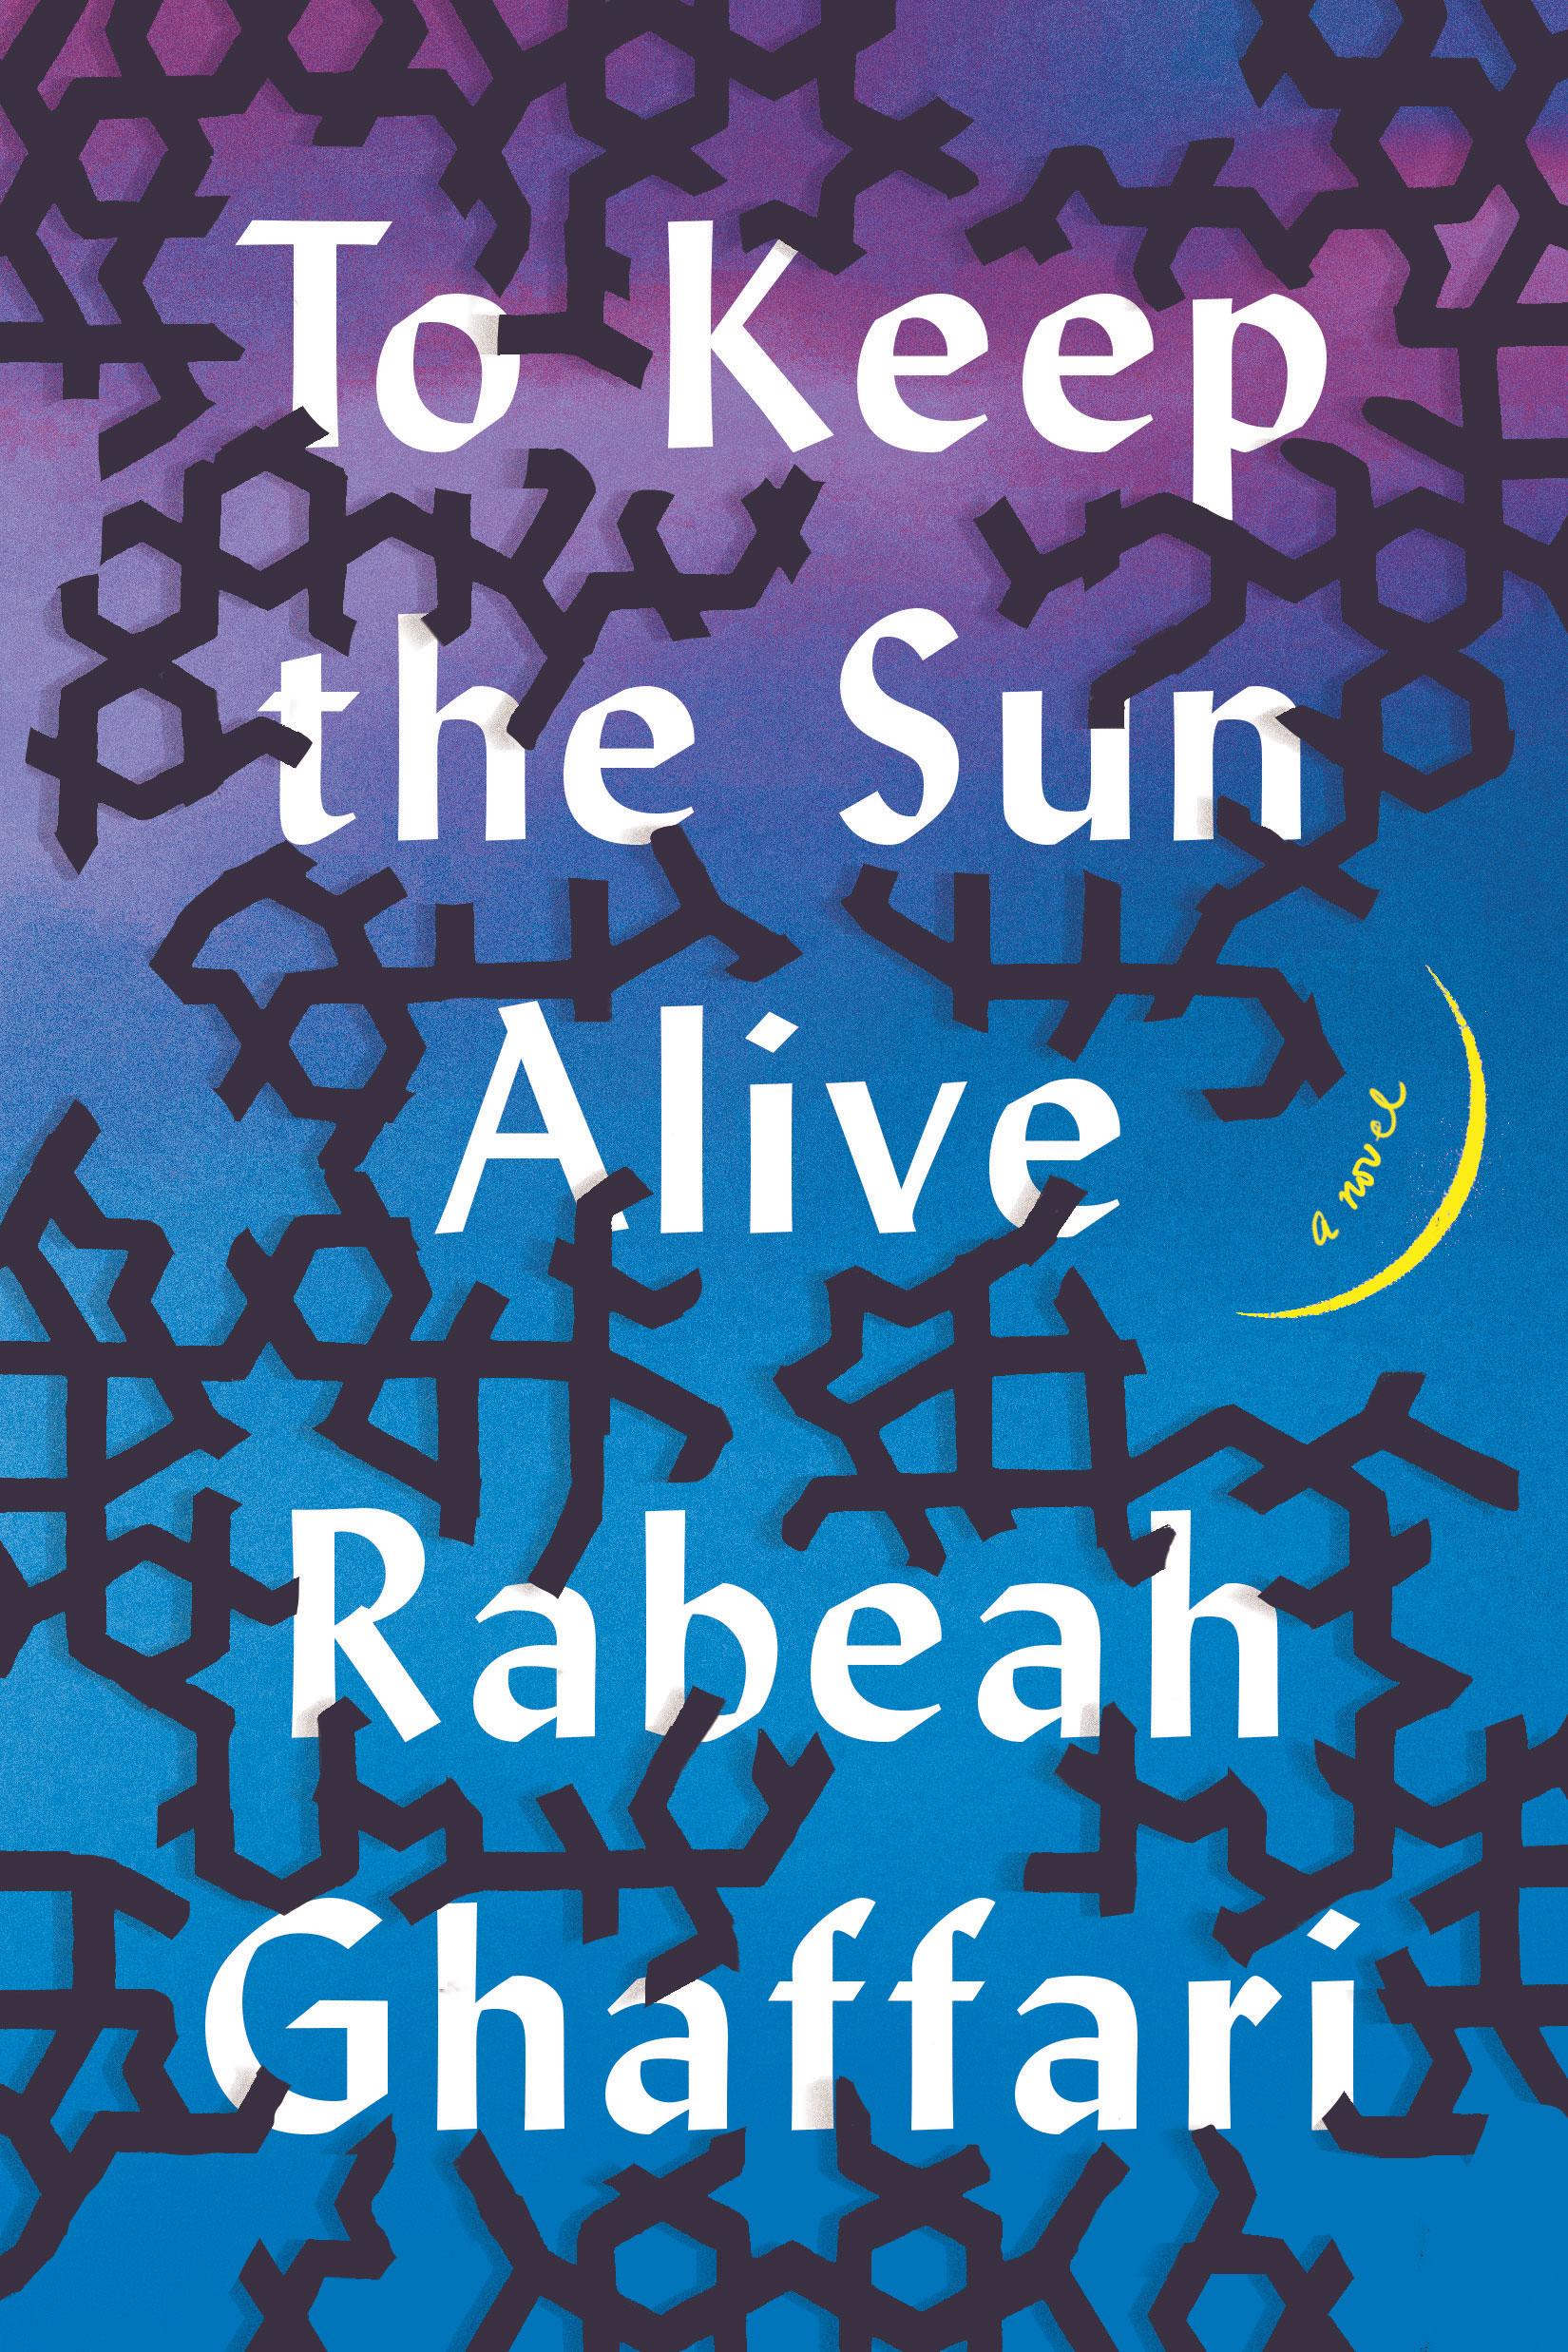 To-Keep-the-Sun-Alive_cvrs-5.jpg